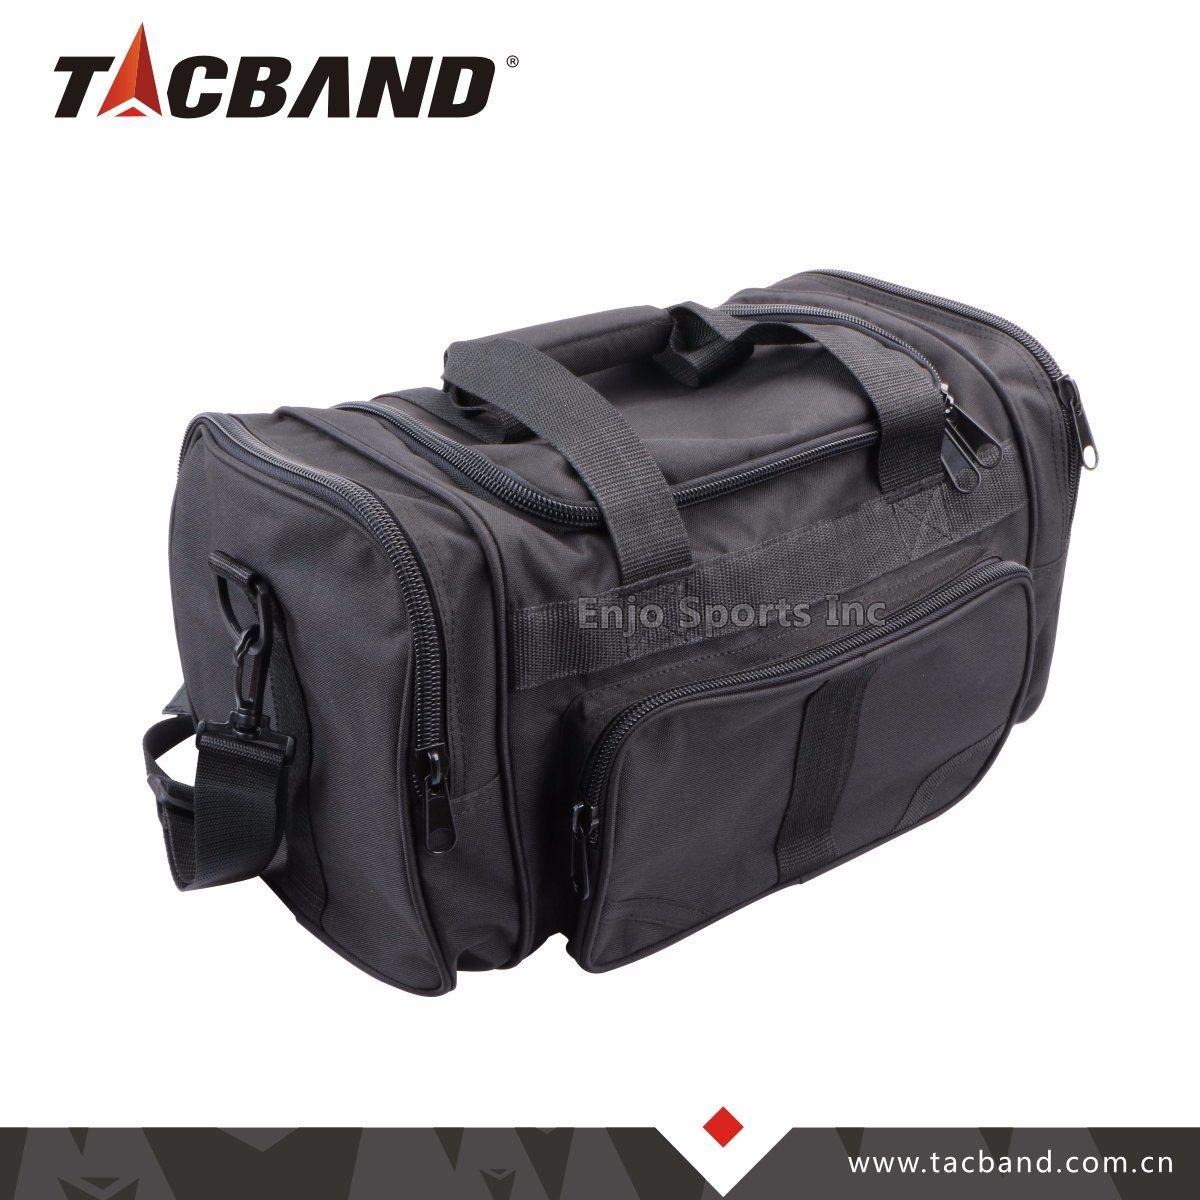 China everyday use military tactical pistol gun pistol shooting range duffle  bags china range bag military 8a50ea577dc